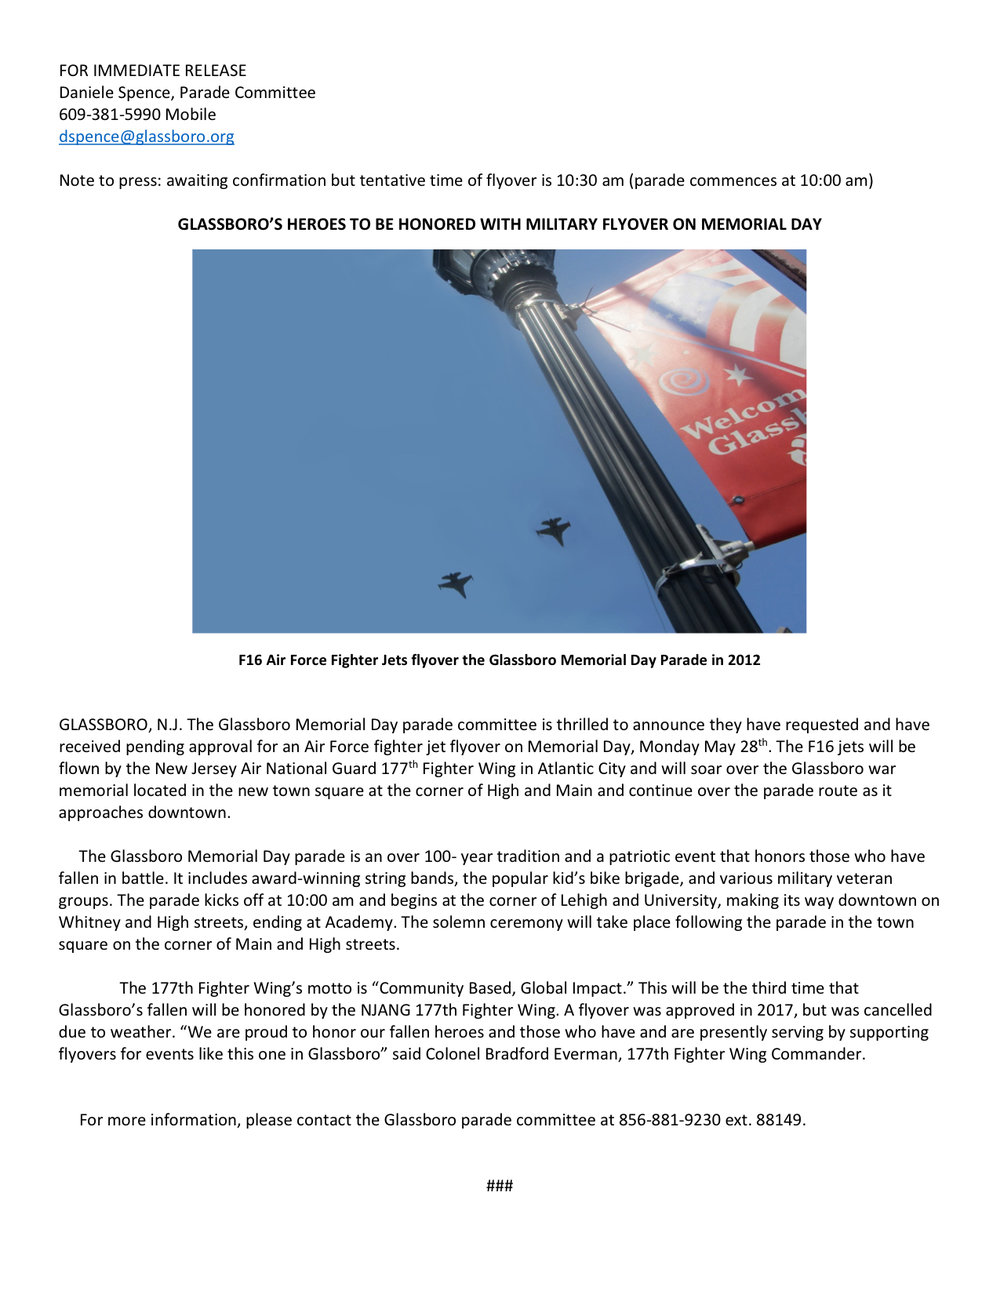 Flyover Press Release.jpeg